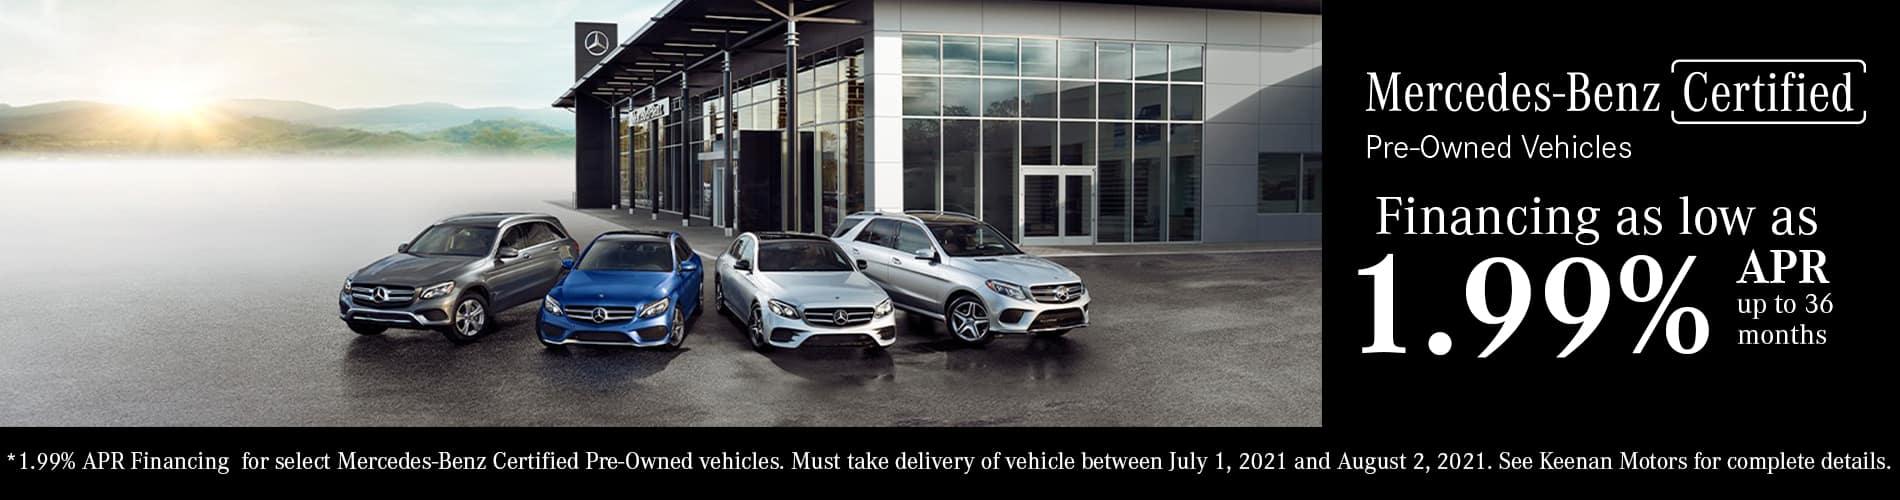 Mercedes-Benz Certified Pre-Owned Financing Specials at Keenan Motors